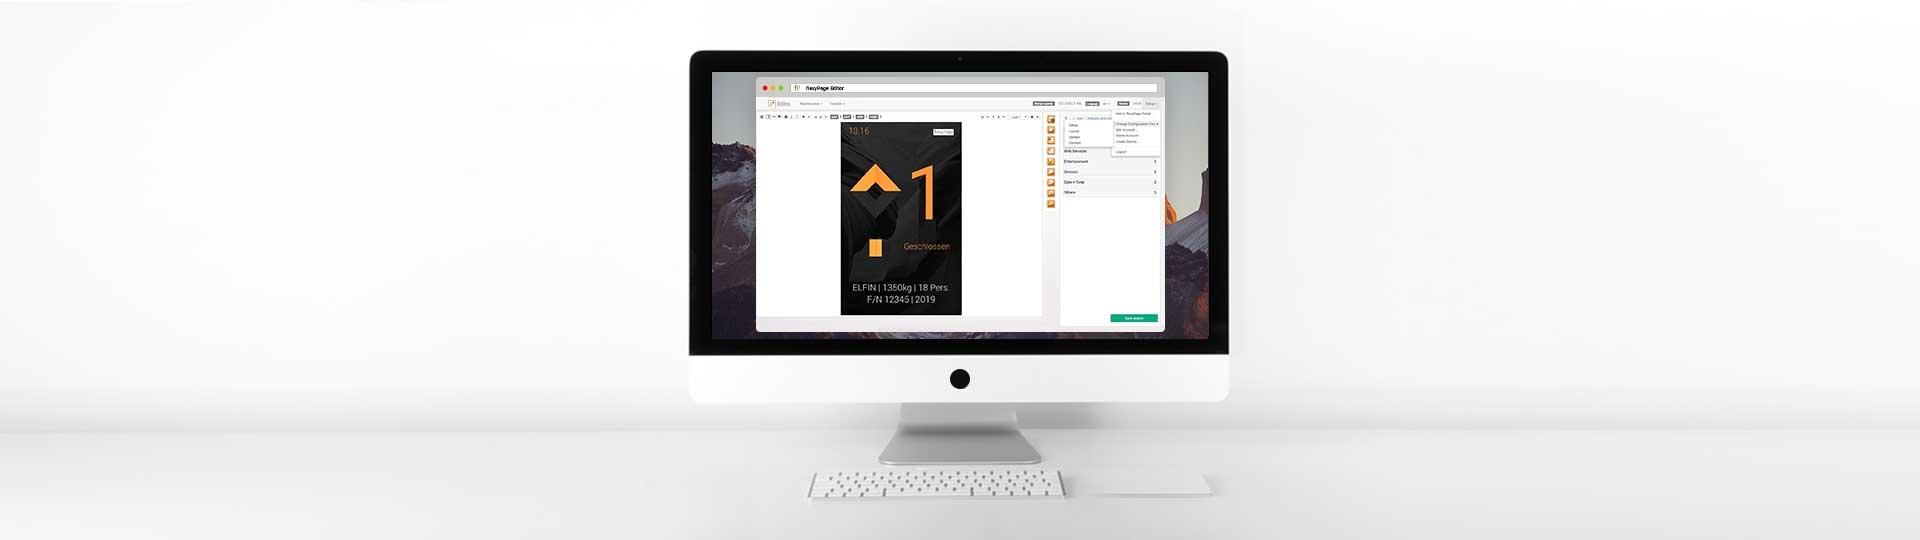 flexyPage Editor